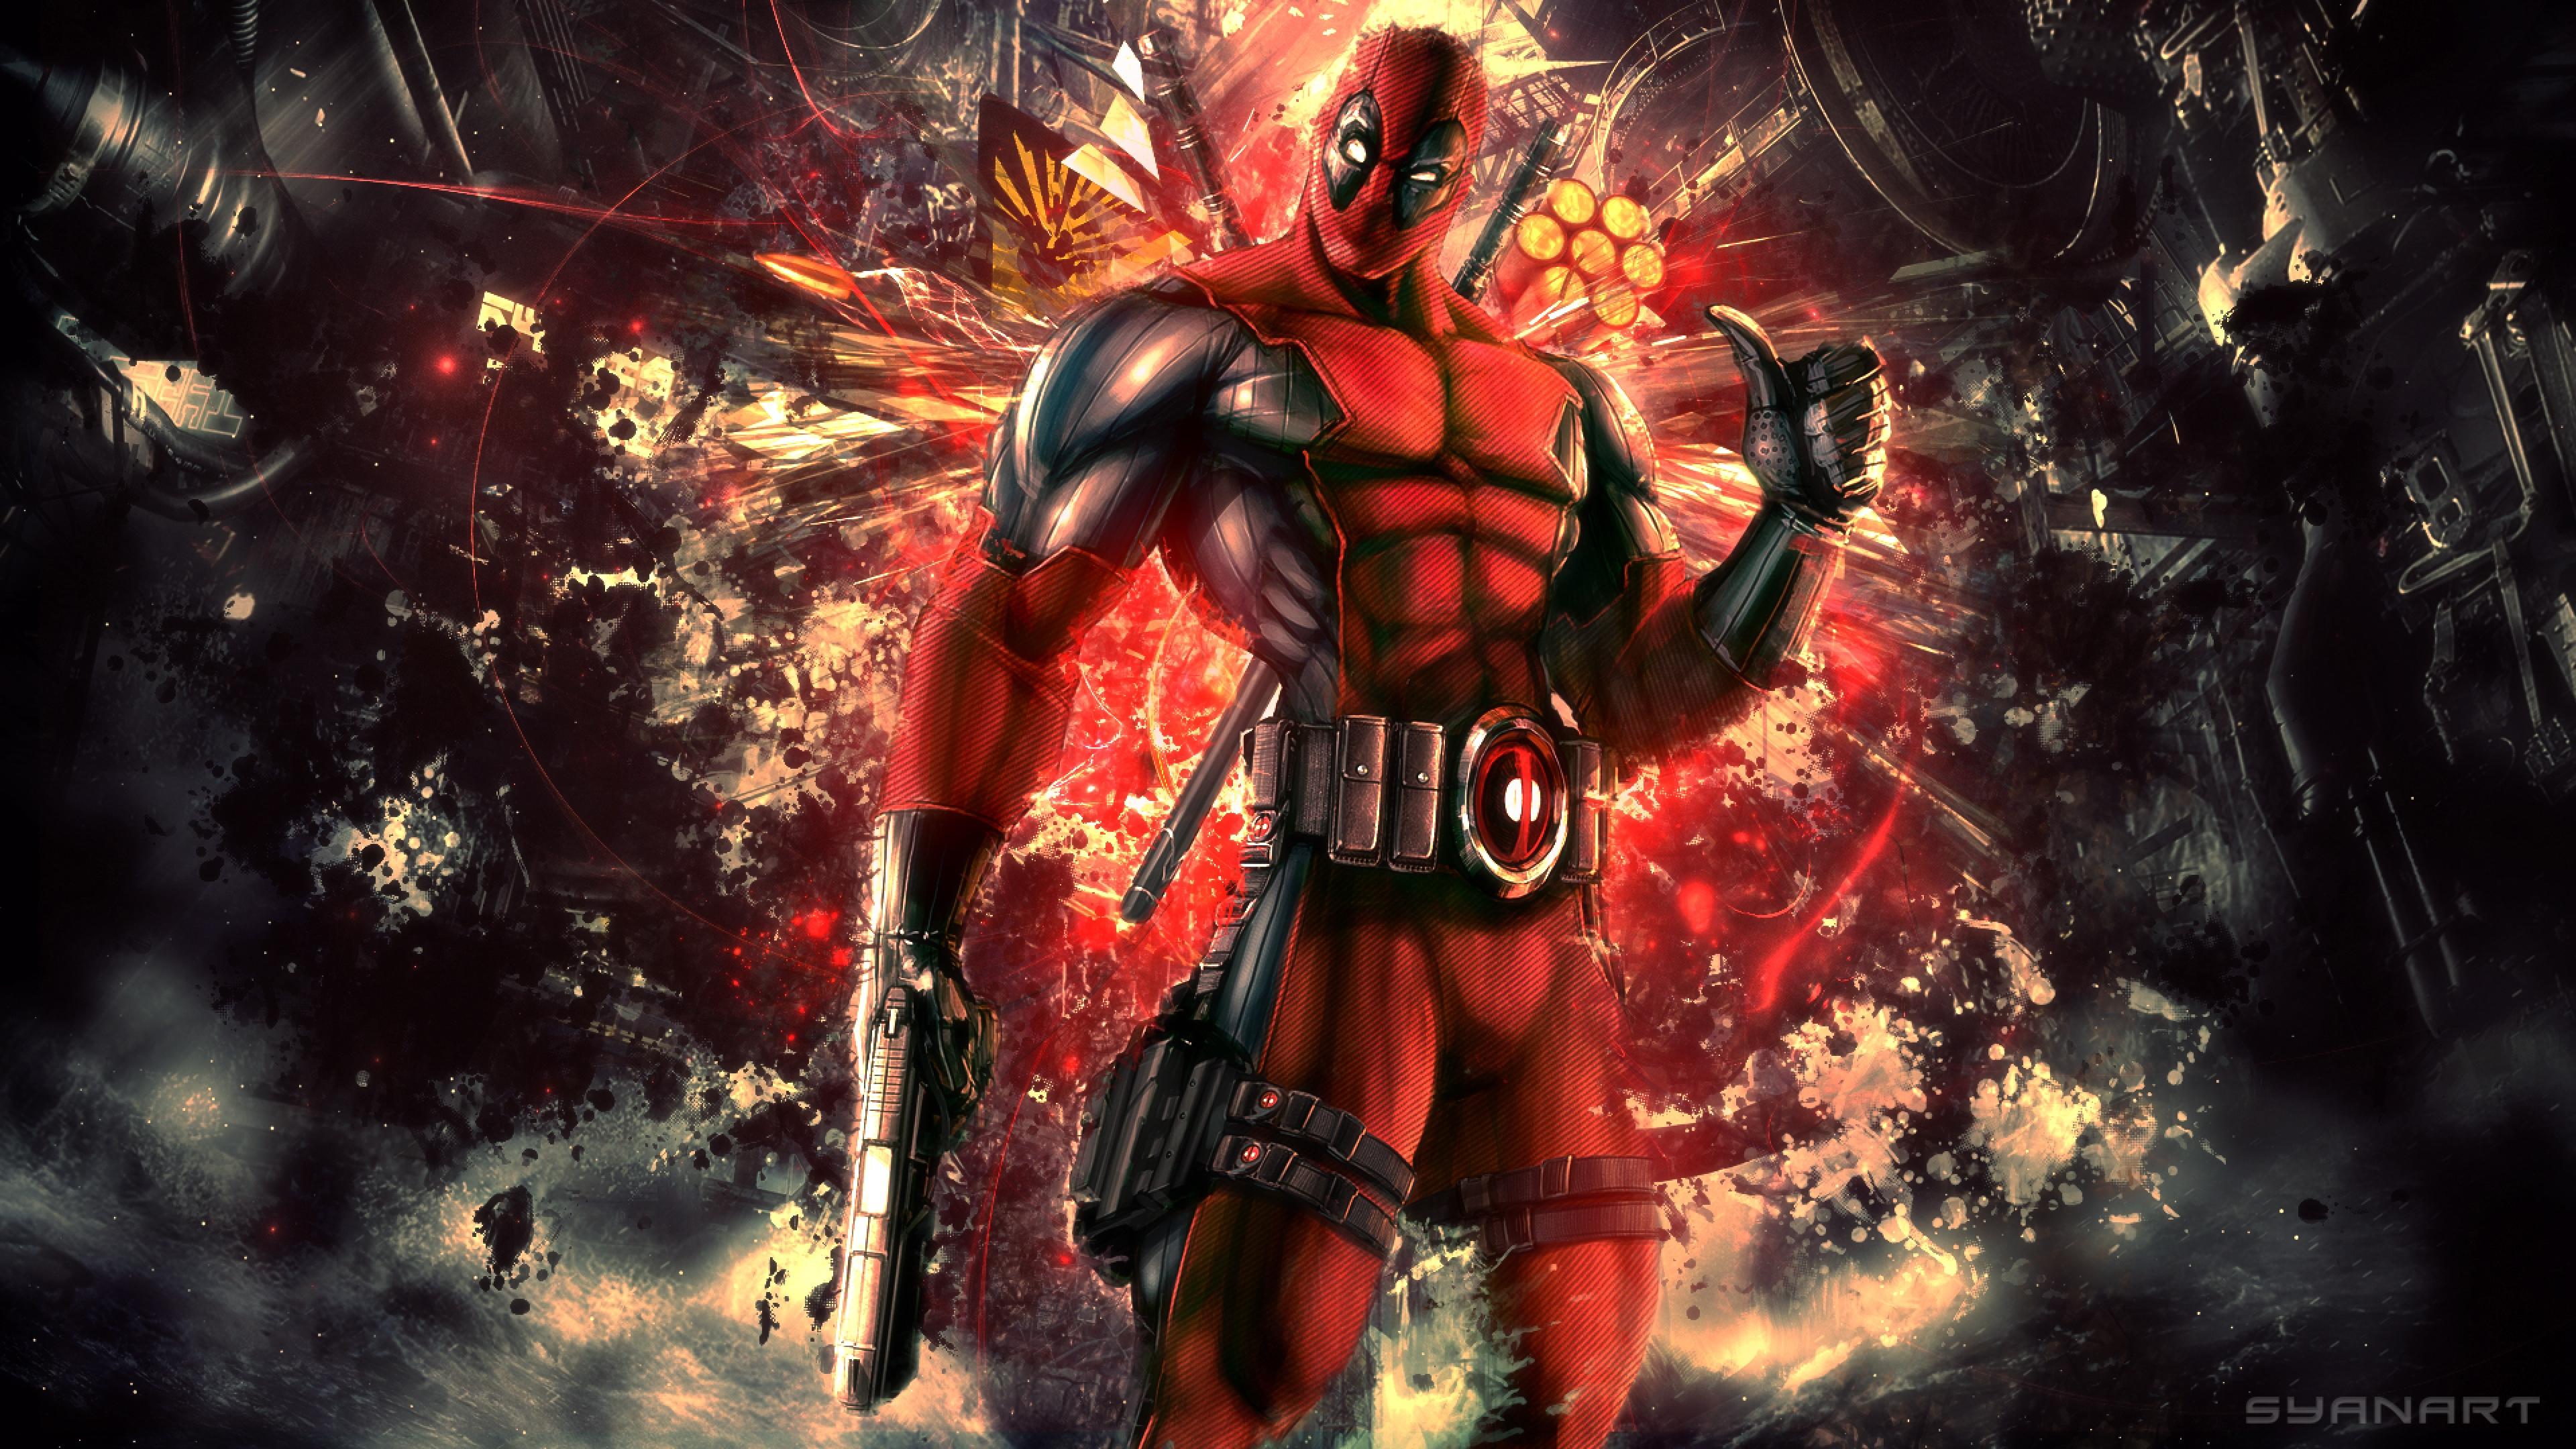 3840x2160 Wallpaper deadpool wade wilson mercenary anti hero high 3840x2160